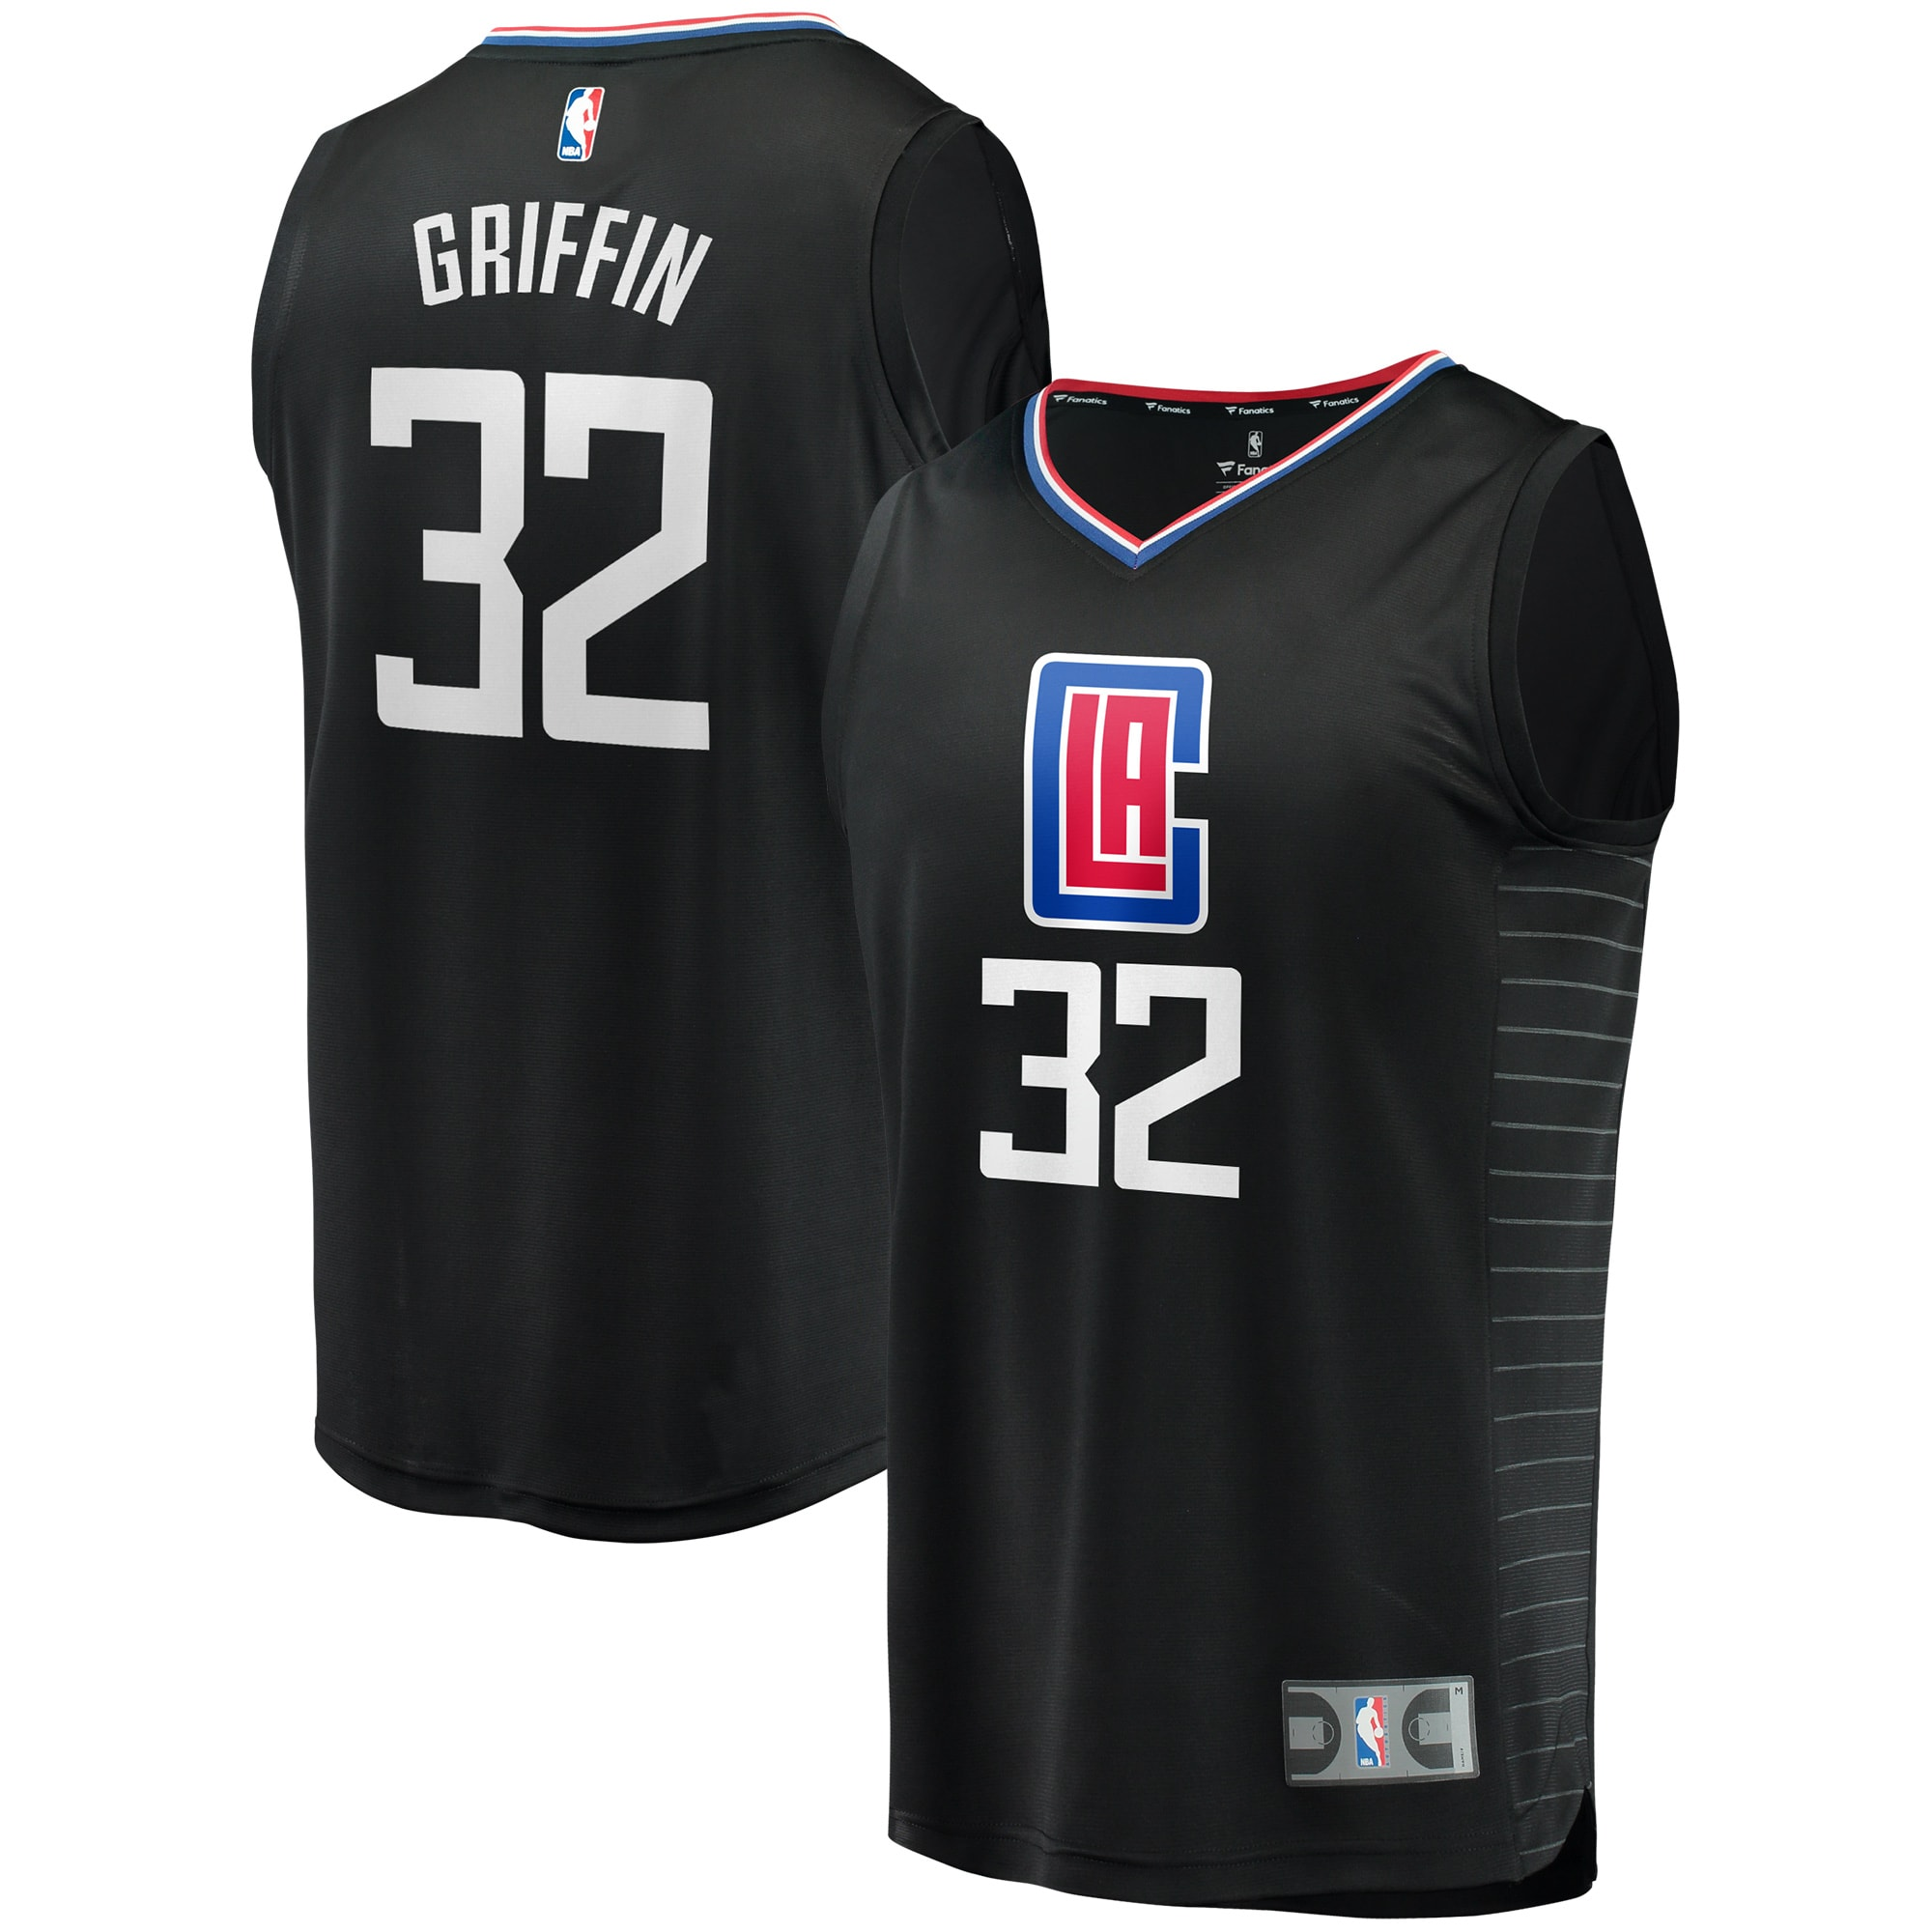 Blake Griffin LA Clippers Fanatics Branded Youth Fast Break Replica Jersey Black - Statement Edition